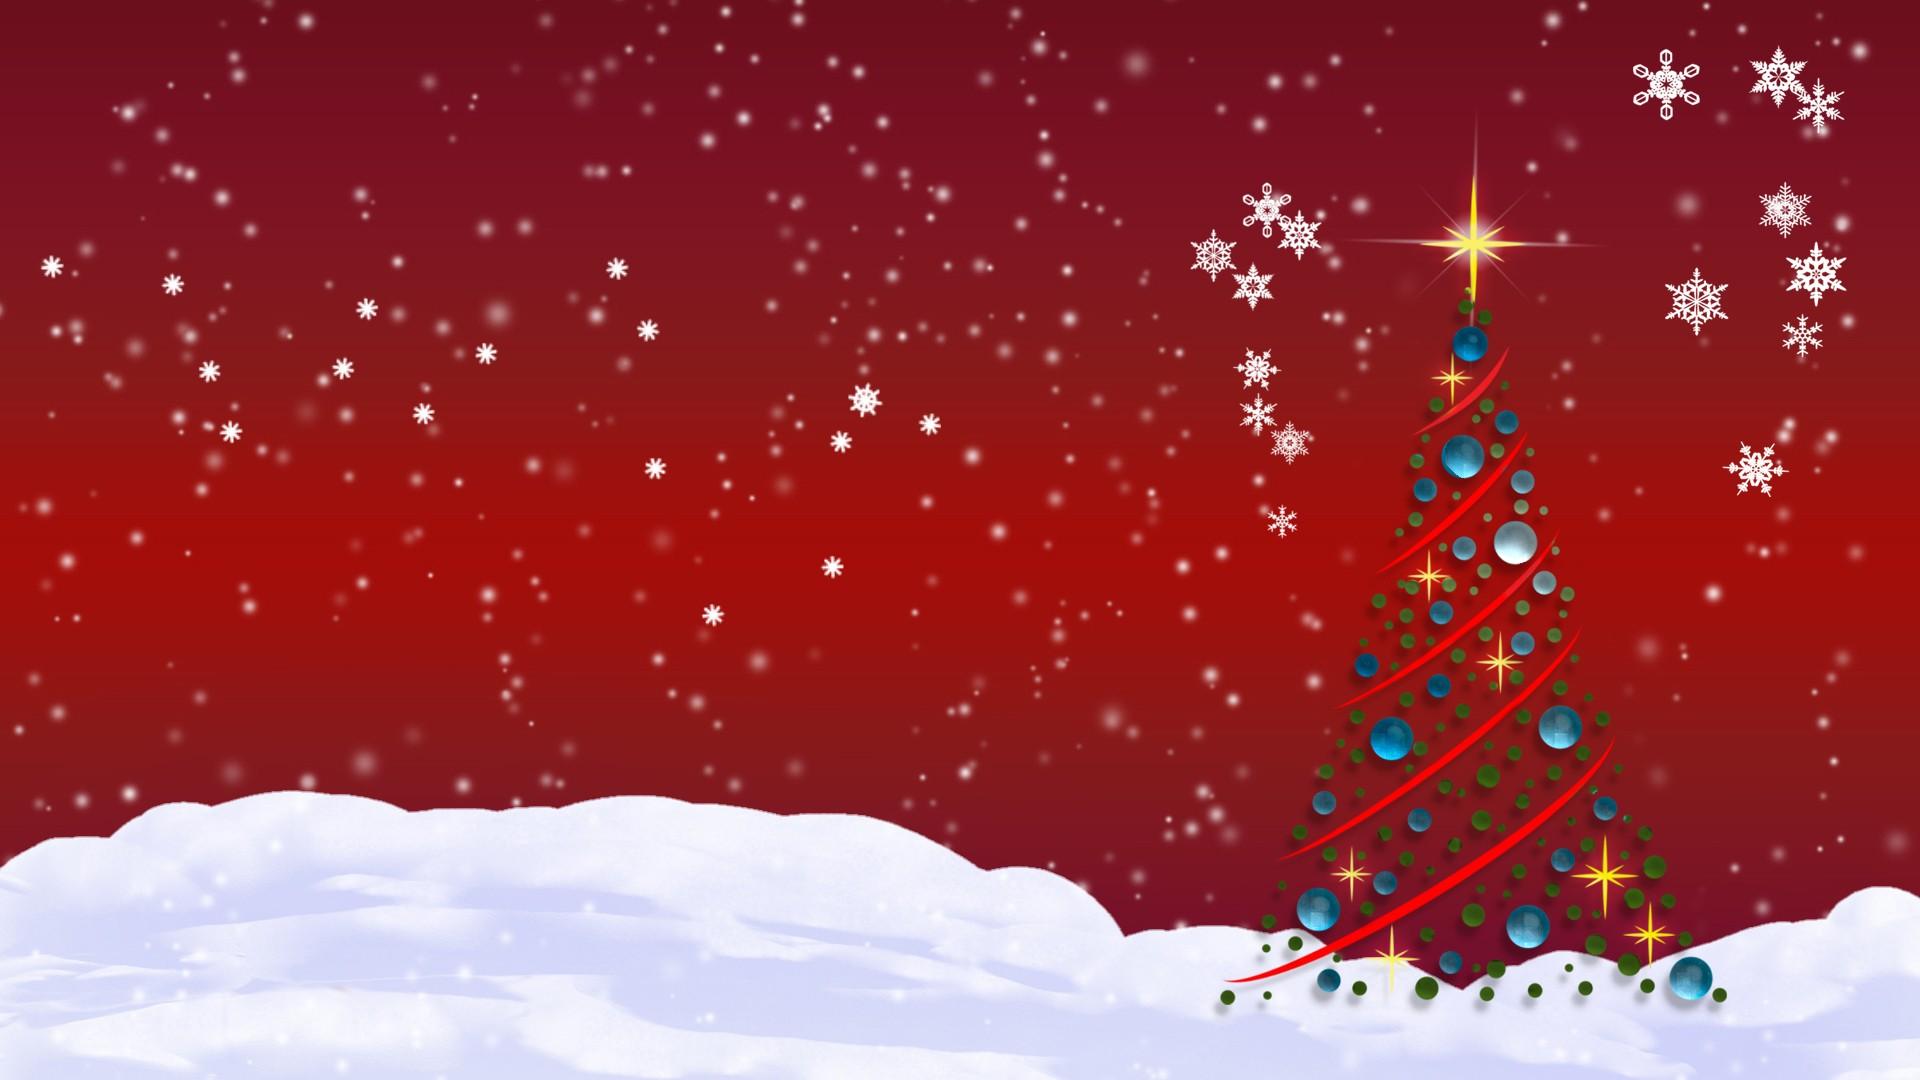 Free Christmas Wallpapers And Screensavers For Mac